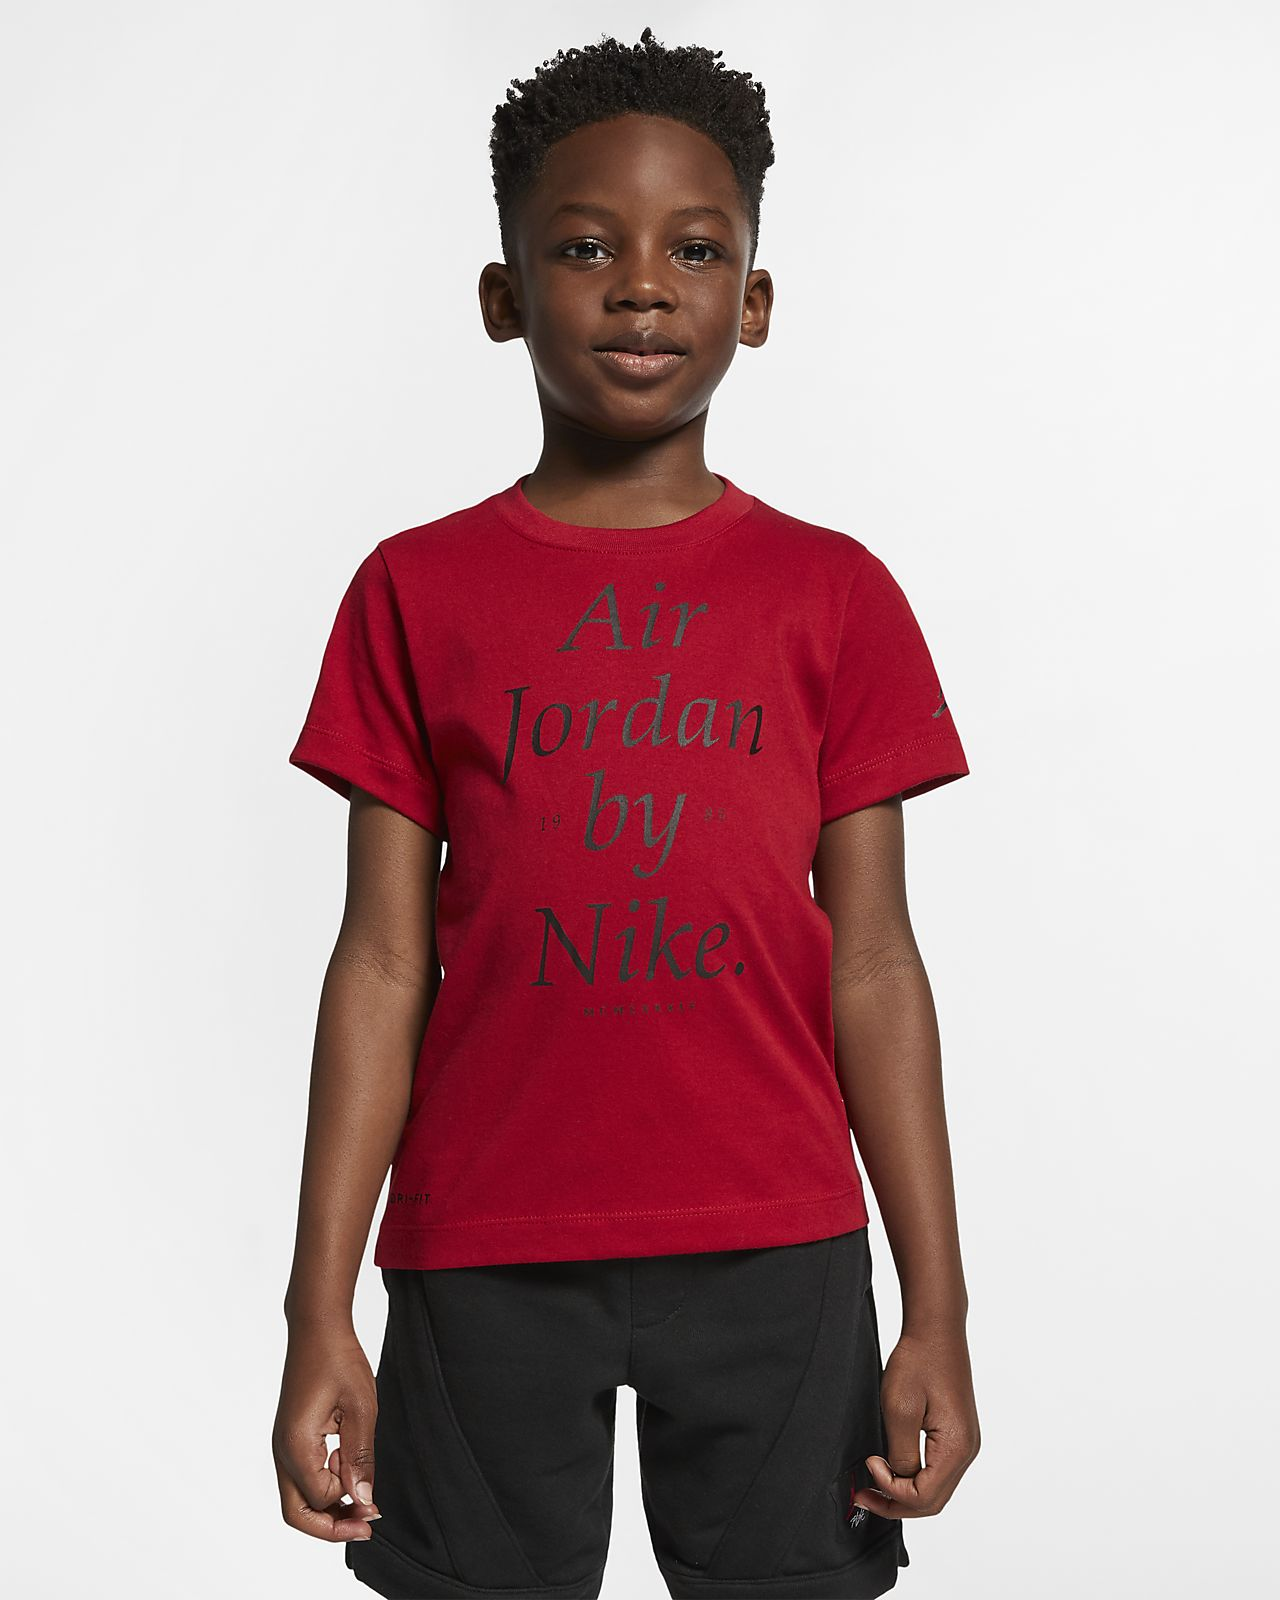 T-shirt Jordan Sportswear - Bambini